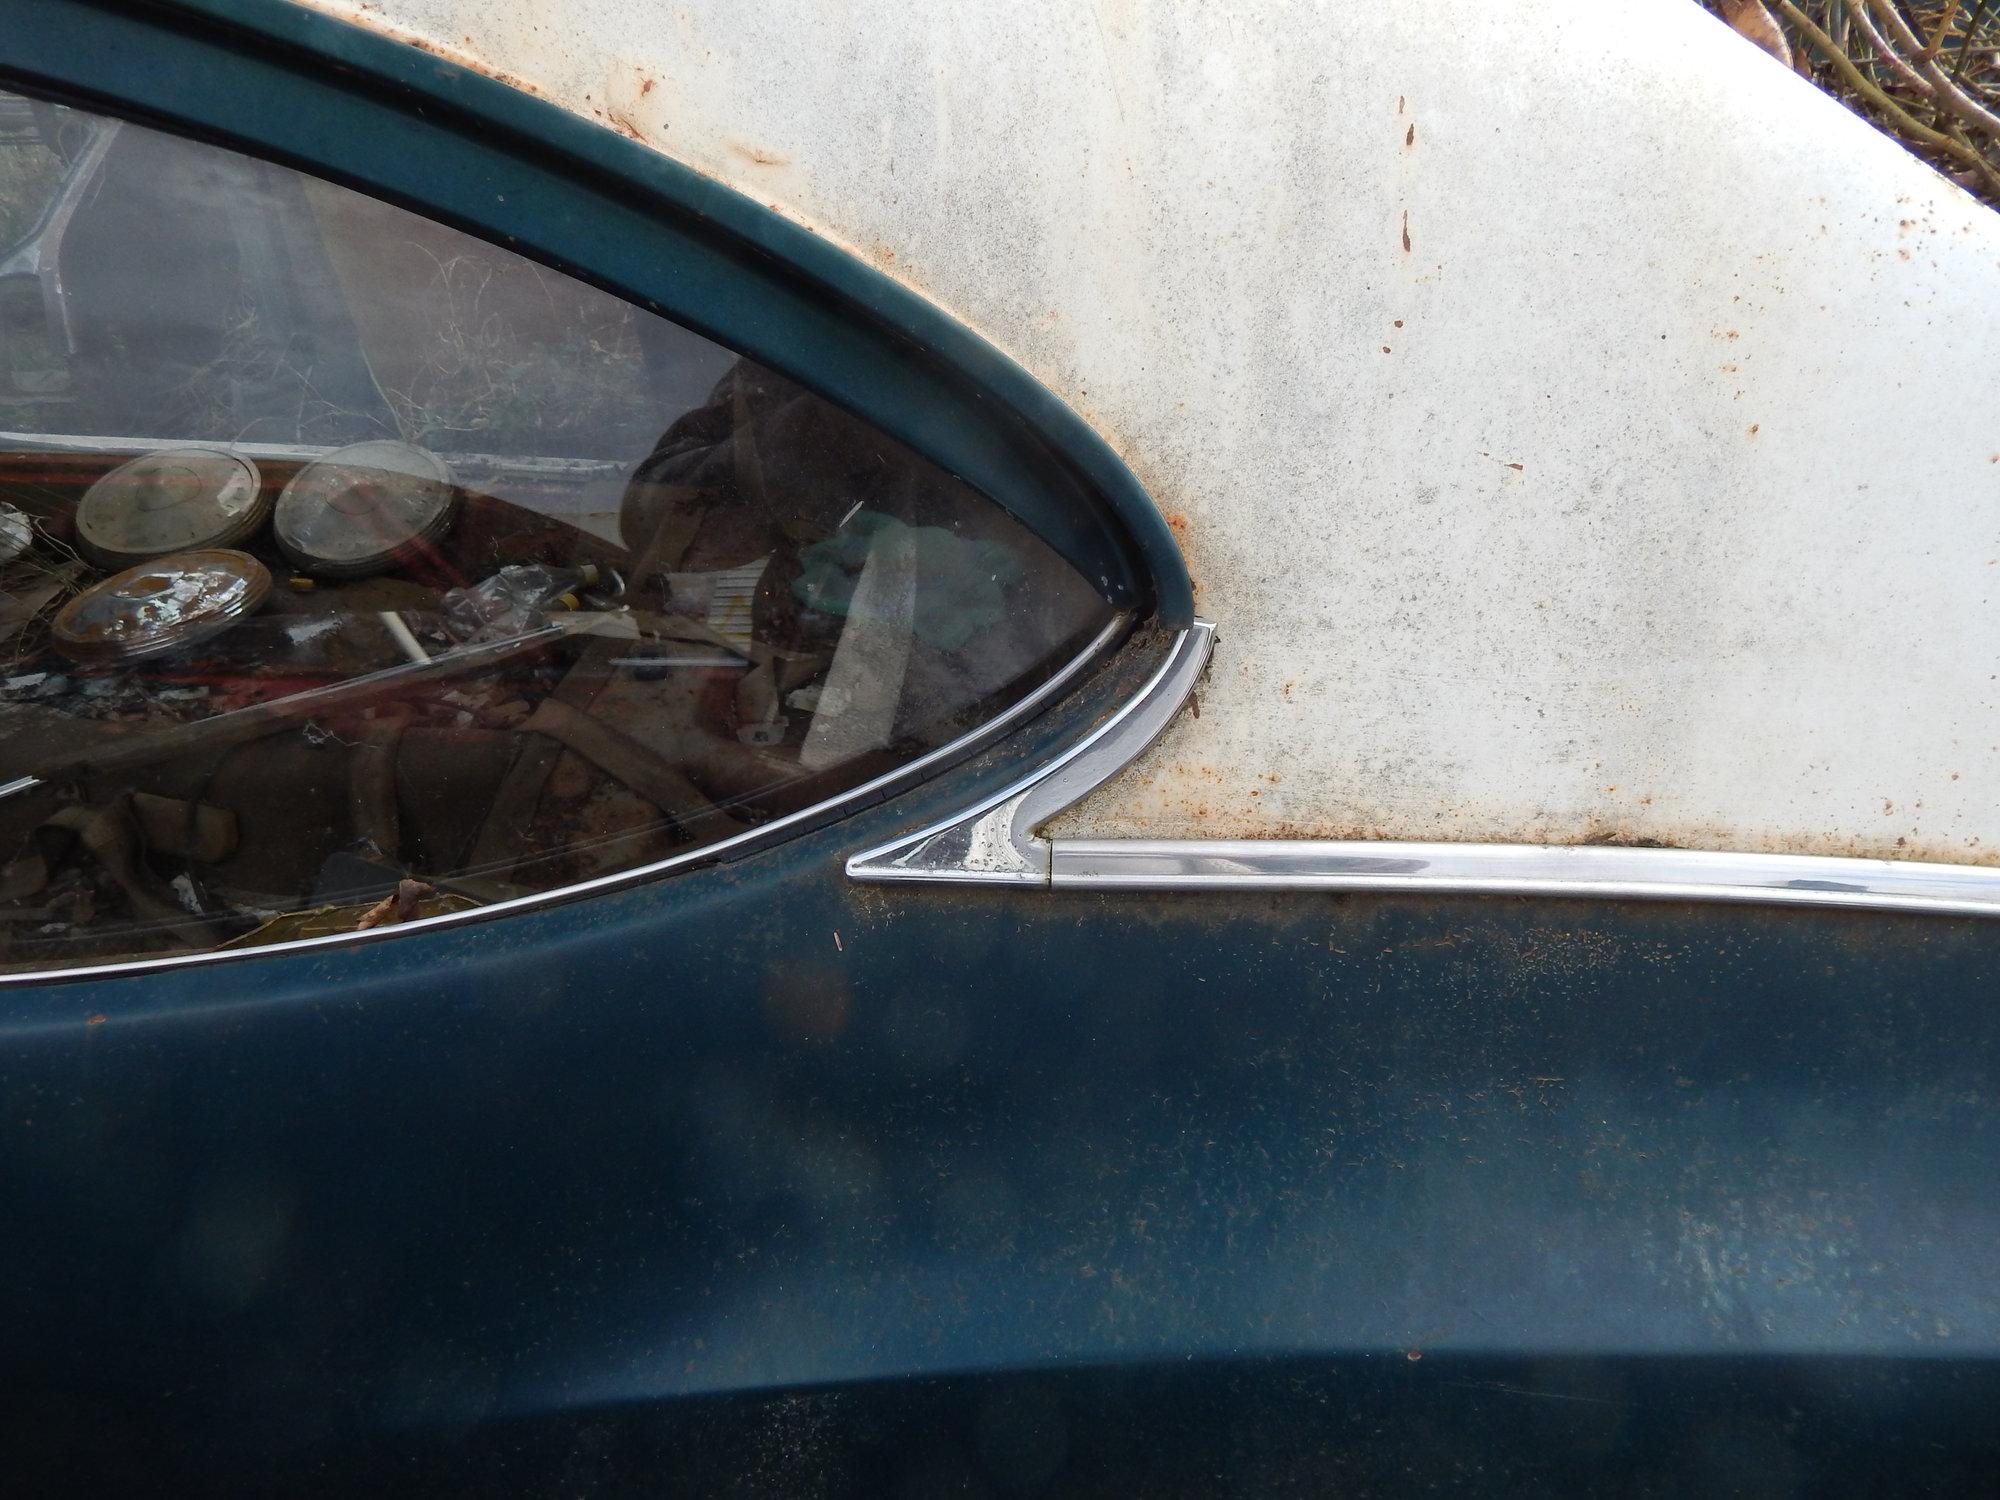 68 69 70 71 72 Cutlass outer chrome door handles and hardware